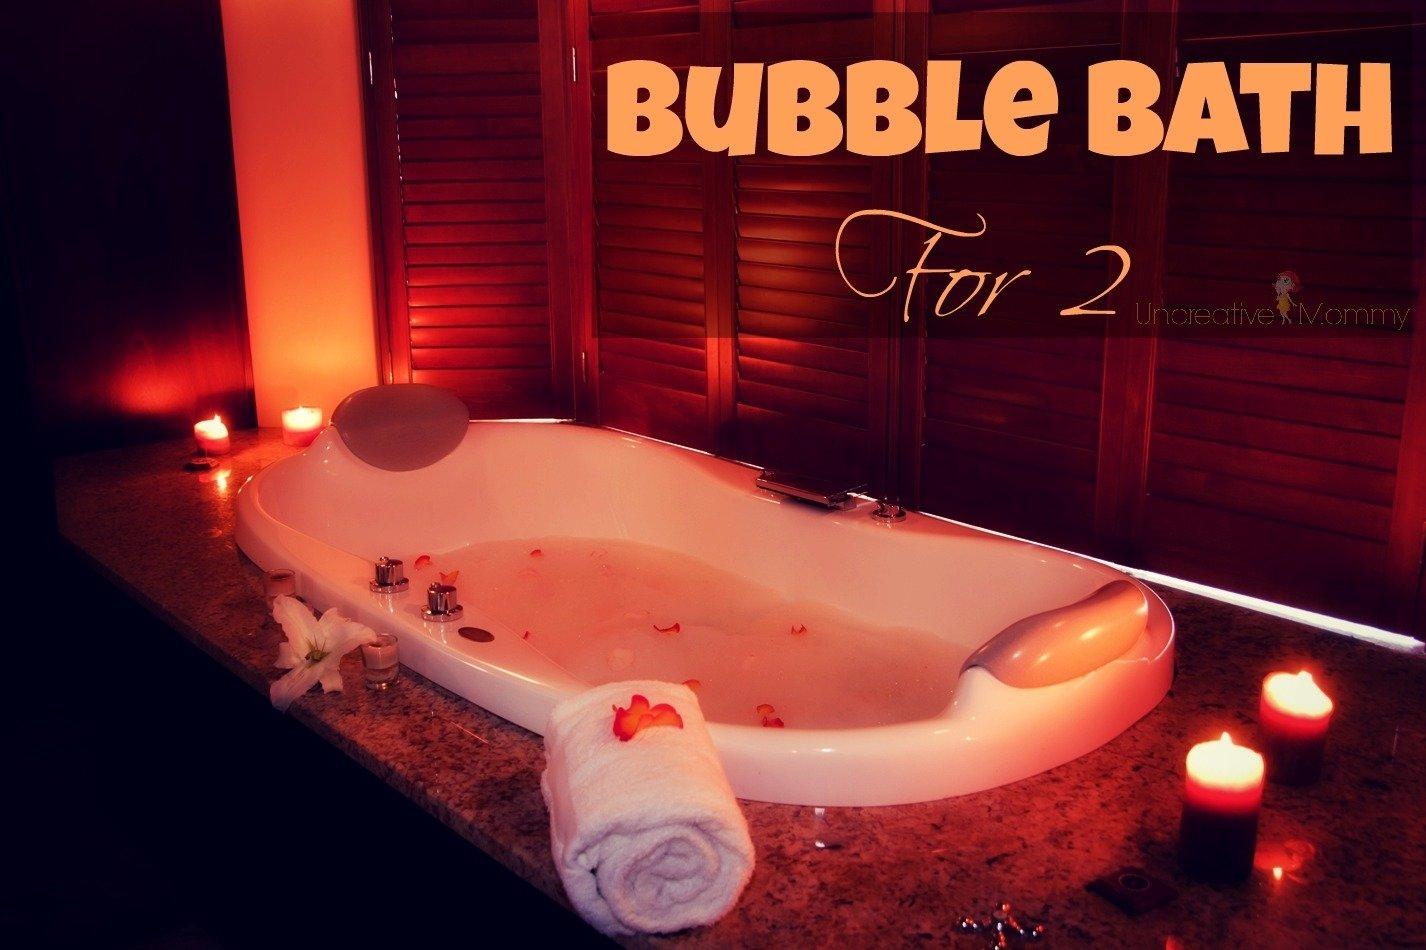 10 Stylish Ideas For A Romantic Night ideas for a romantic night at home picturesque design ideas home ideas 1